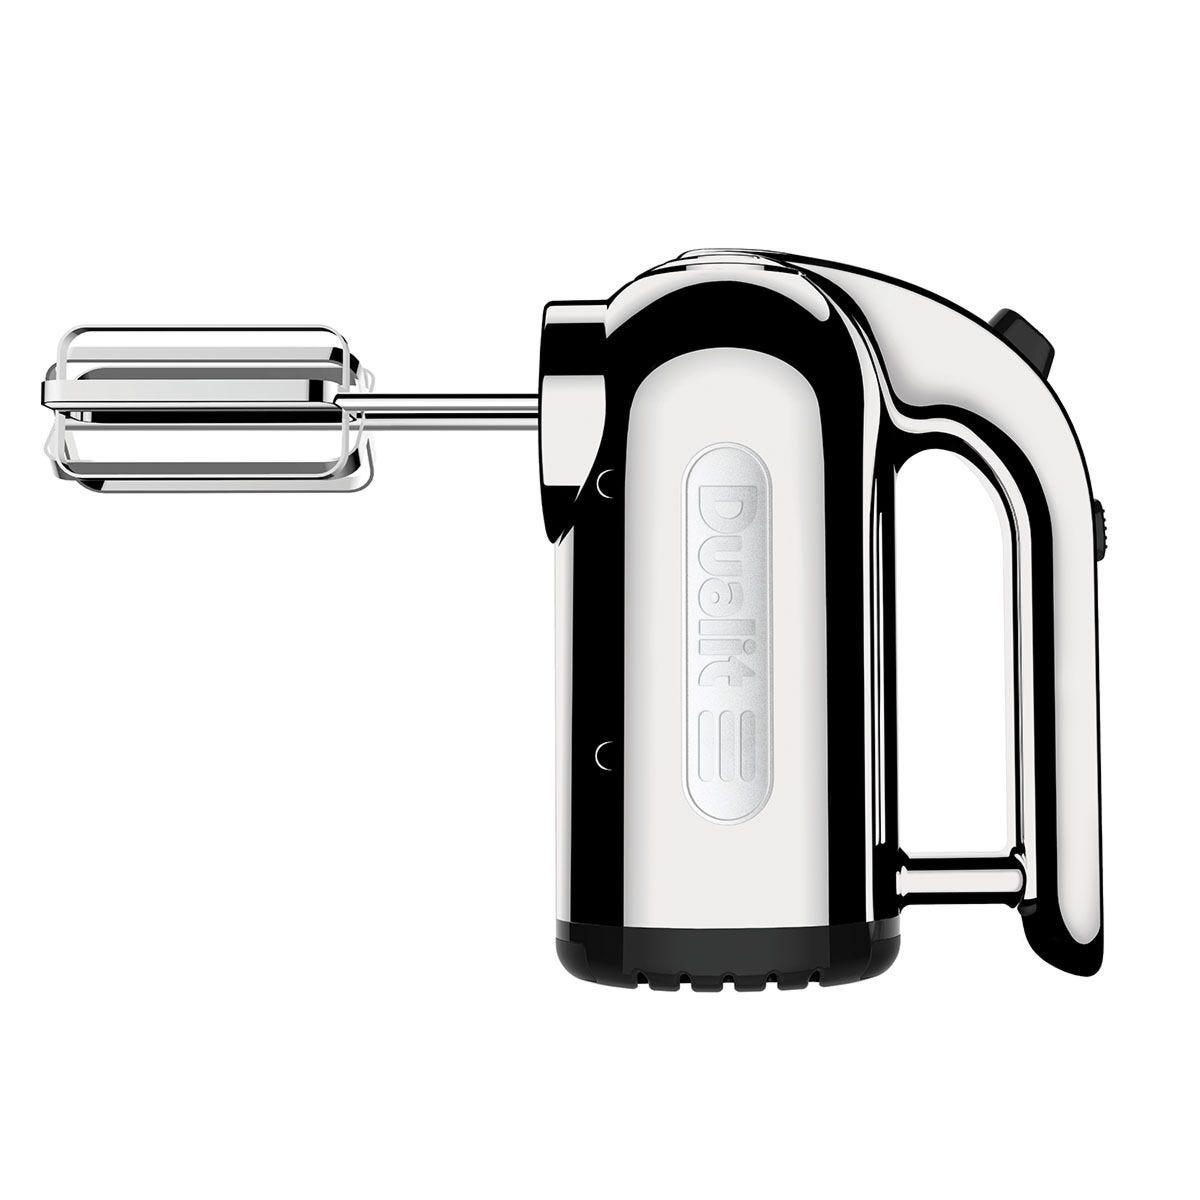 Dualit DA9300 400W Hand Mixer – Polished Silver